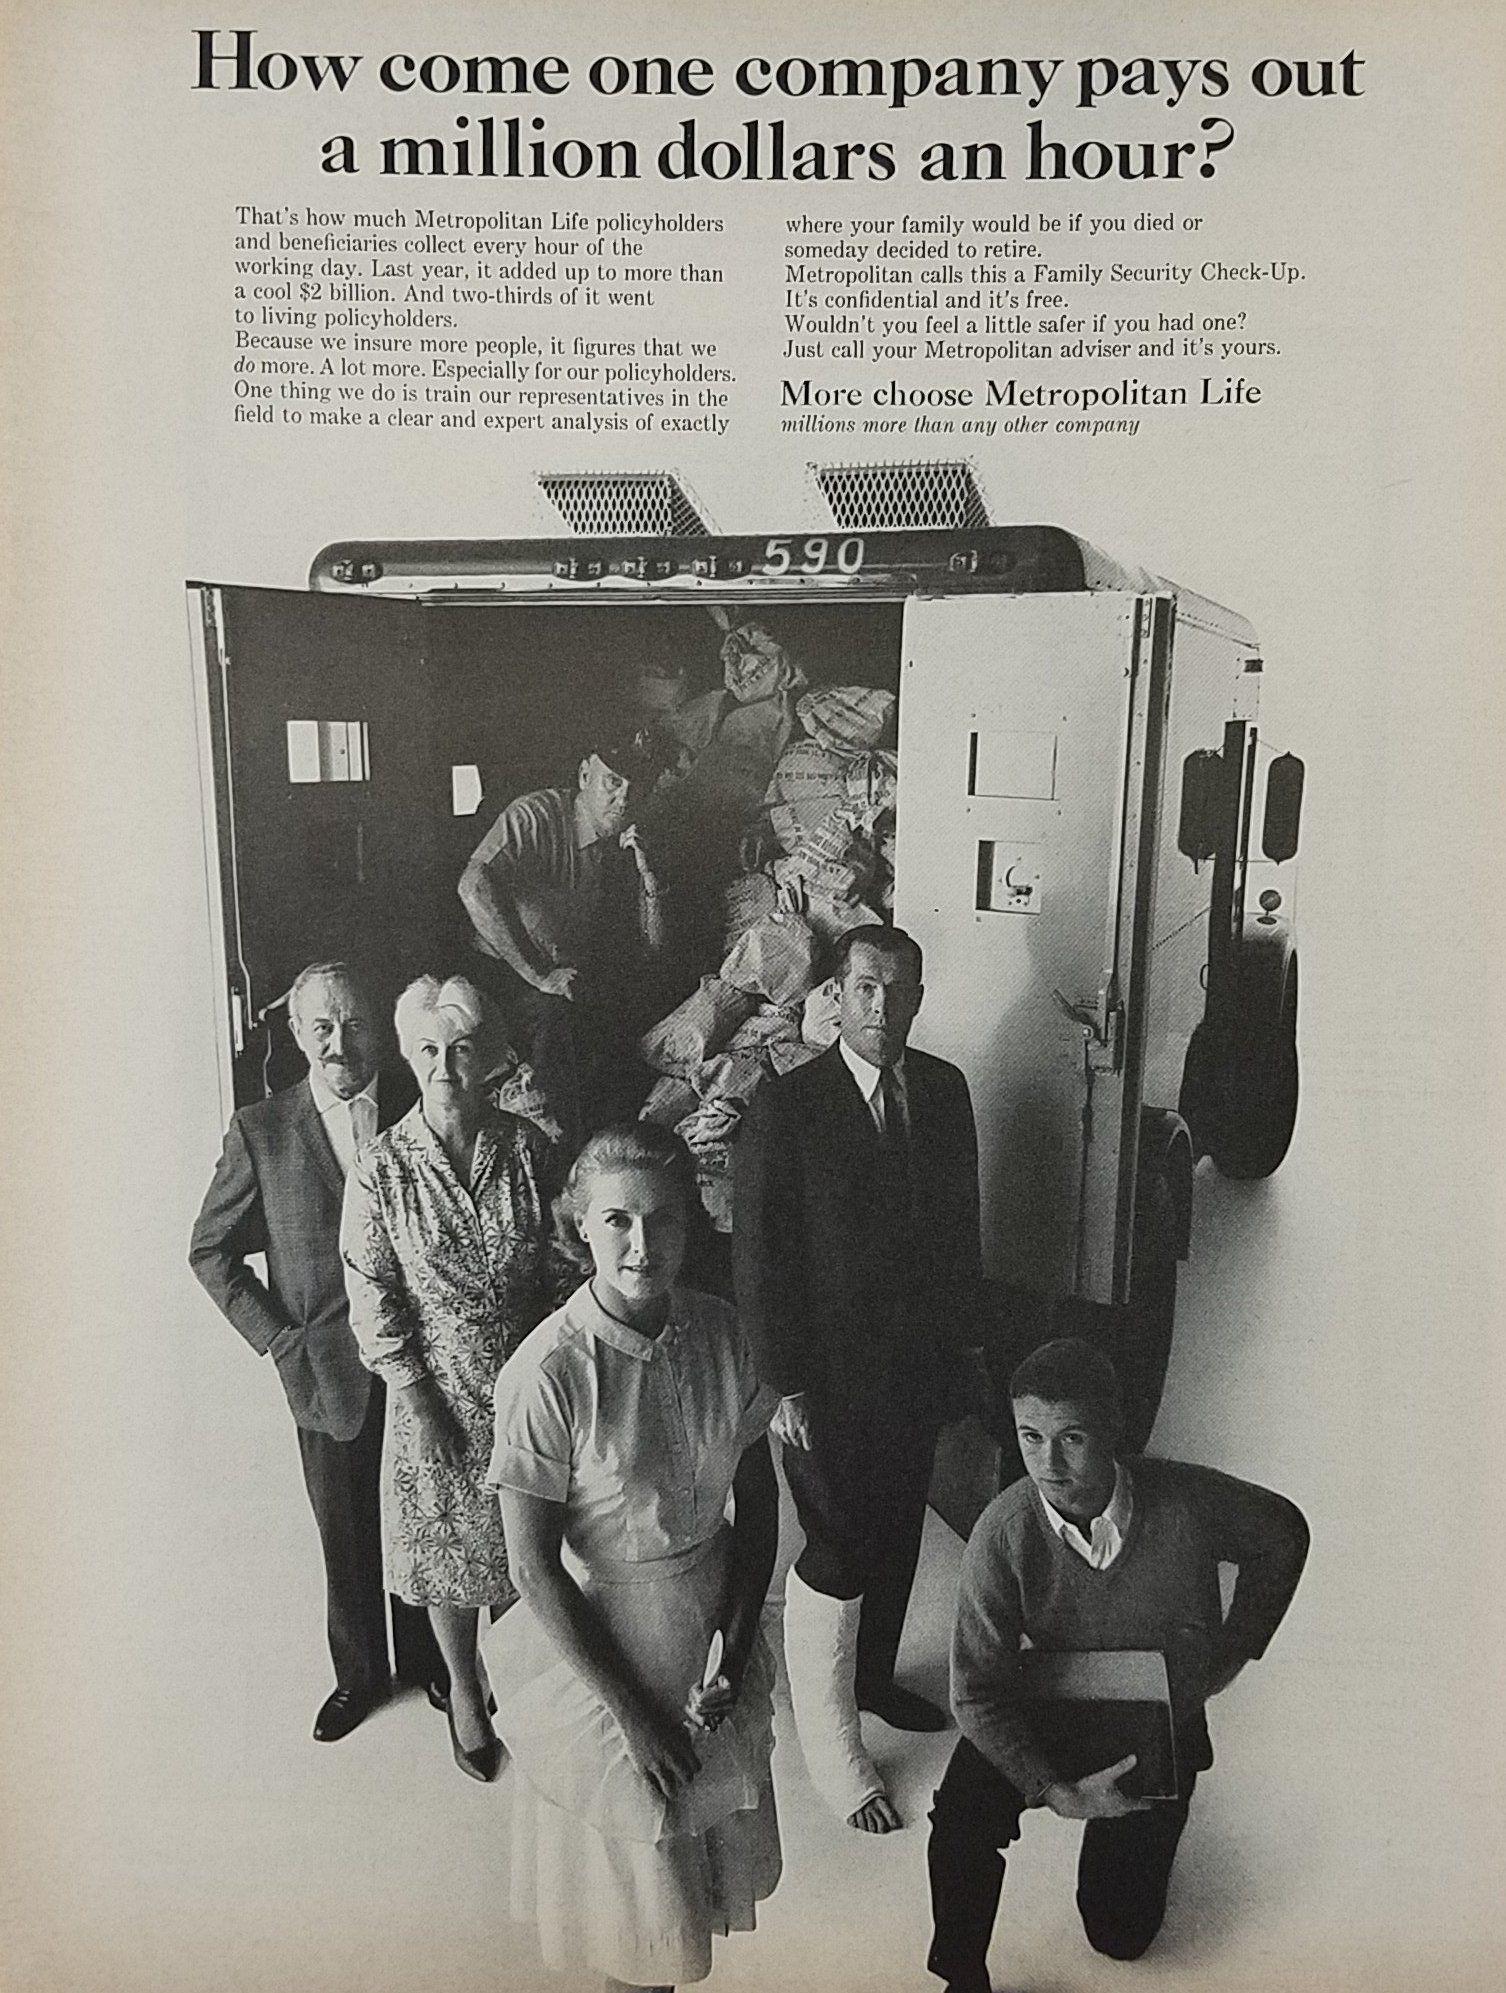 1964 Metropolitan Life Insurance Vintage Ad Pays Out 1 Million